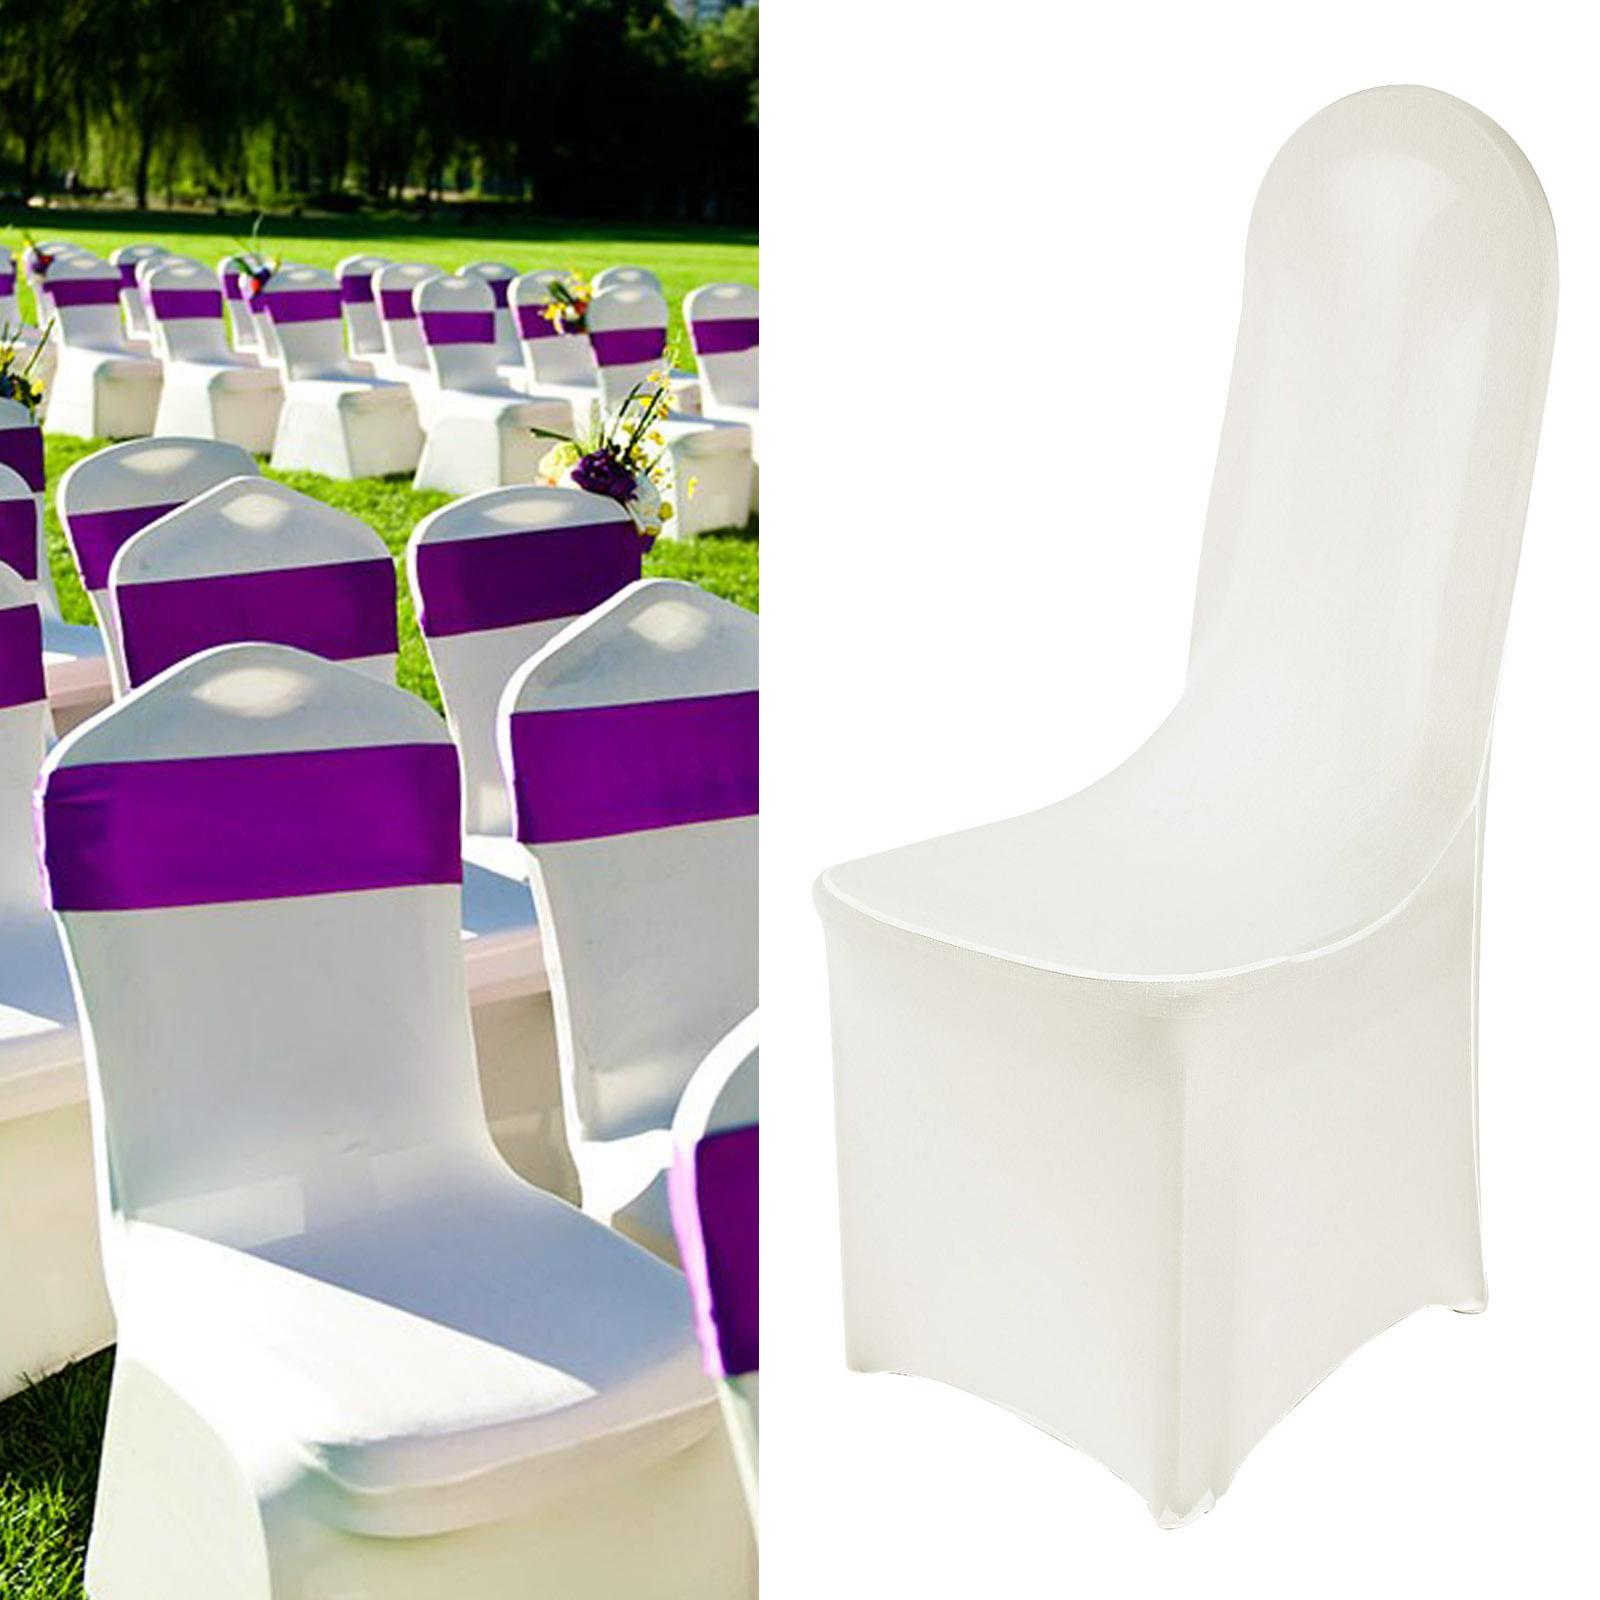 stuhlhussen stretch universell hussen stuhl berzug stuhlbezug hochzeit 1 100st ebay. Black Bedroom Furniture Sets. Home Design Ideas